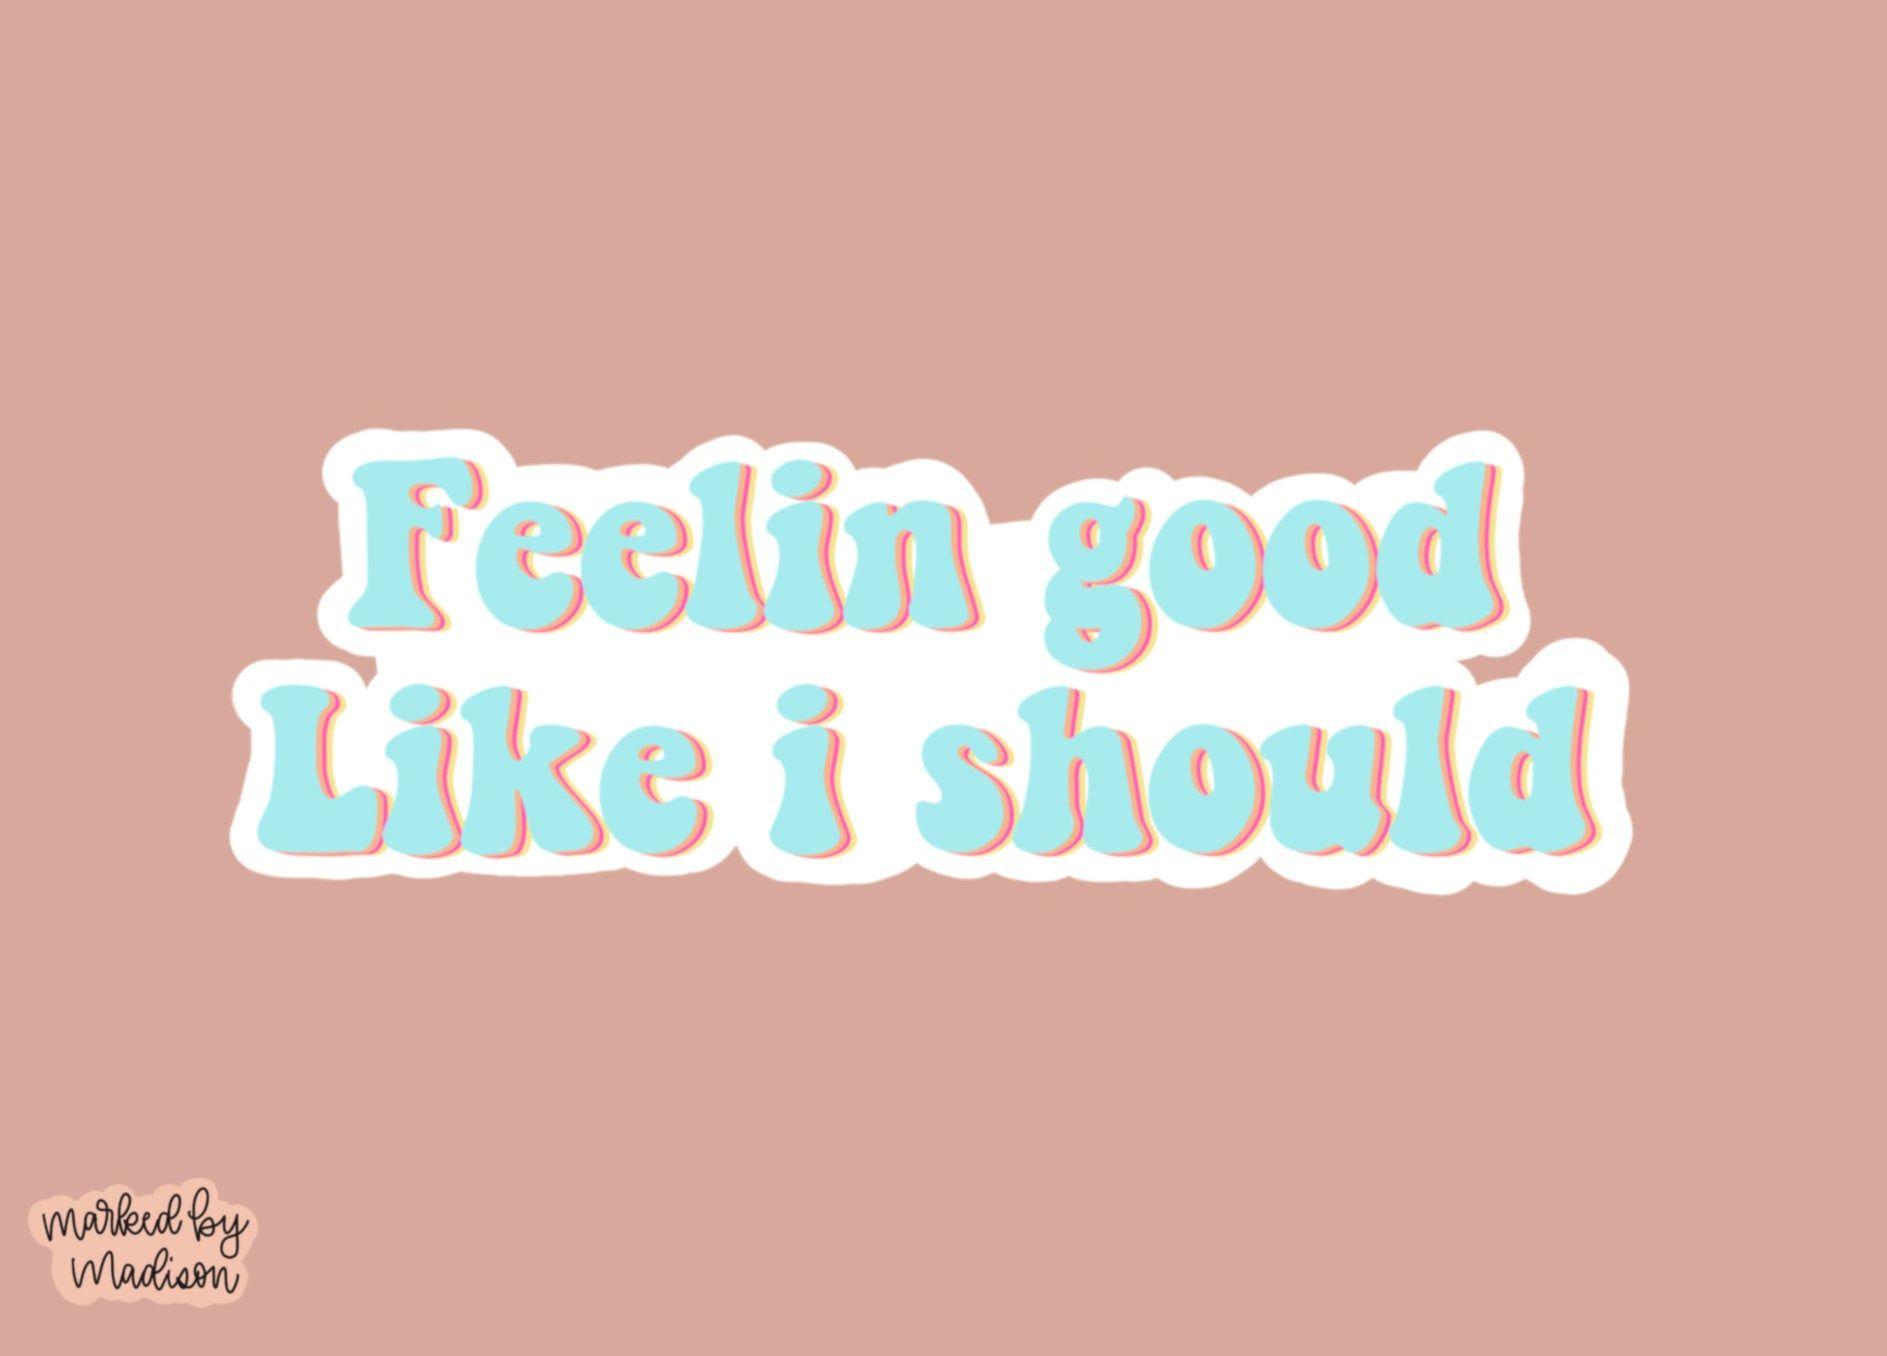 Feelin Good Sticker Etsy In 2020 Sassy Wallpaper Funny Phone Wallpaper Happy Monday Quotes